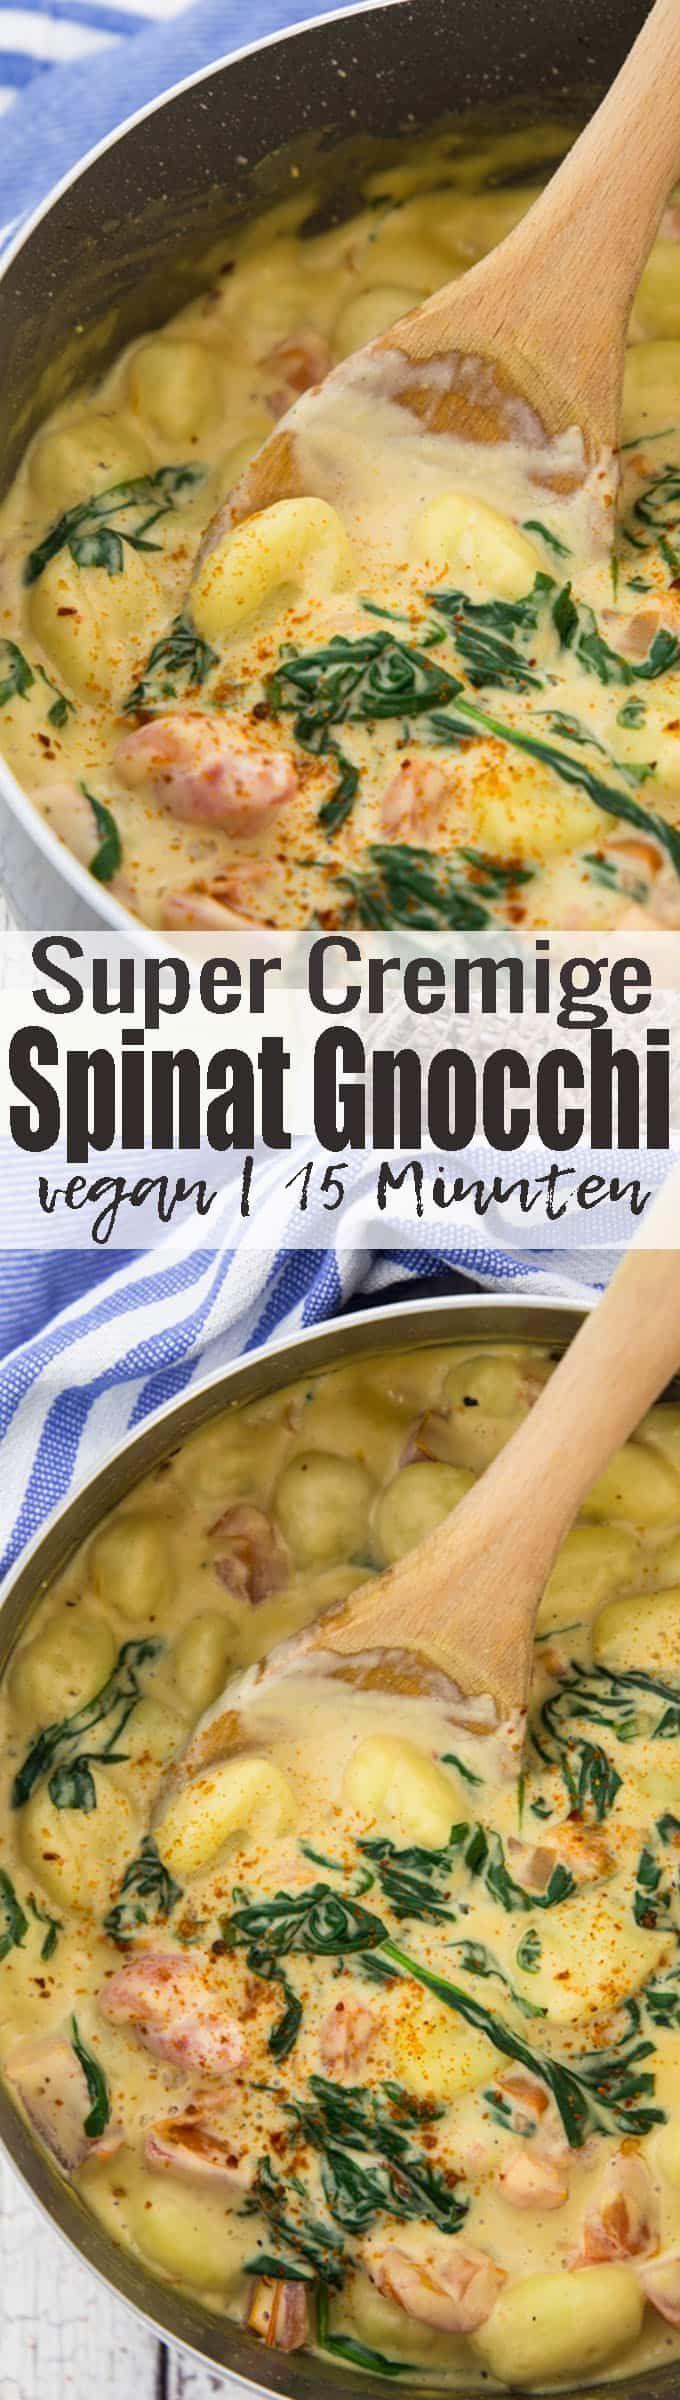 Vegane Gnocchi mit cremiger Spinatsauce